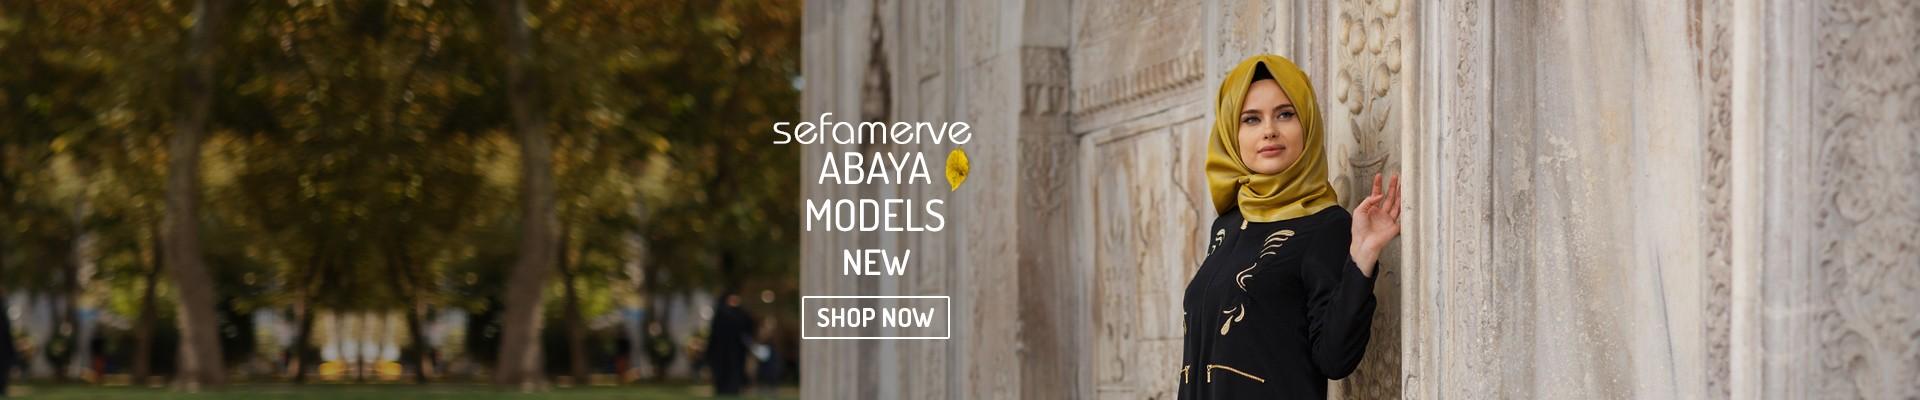 Abaya Models